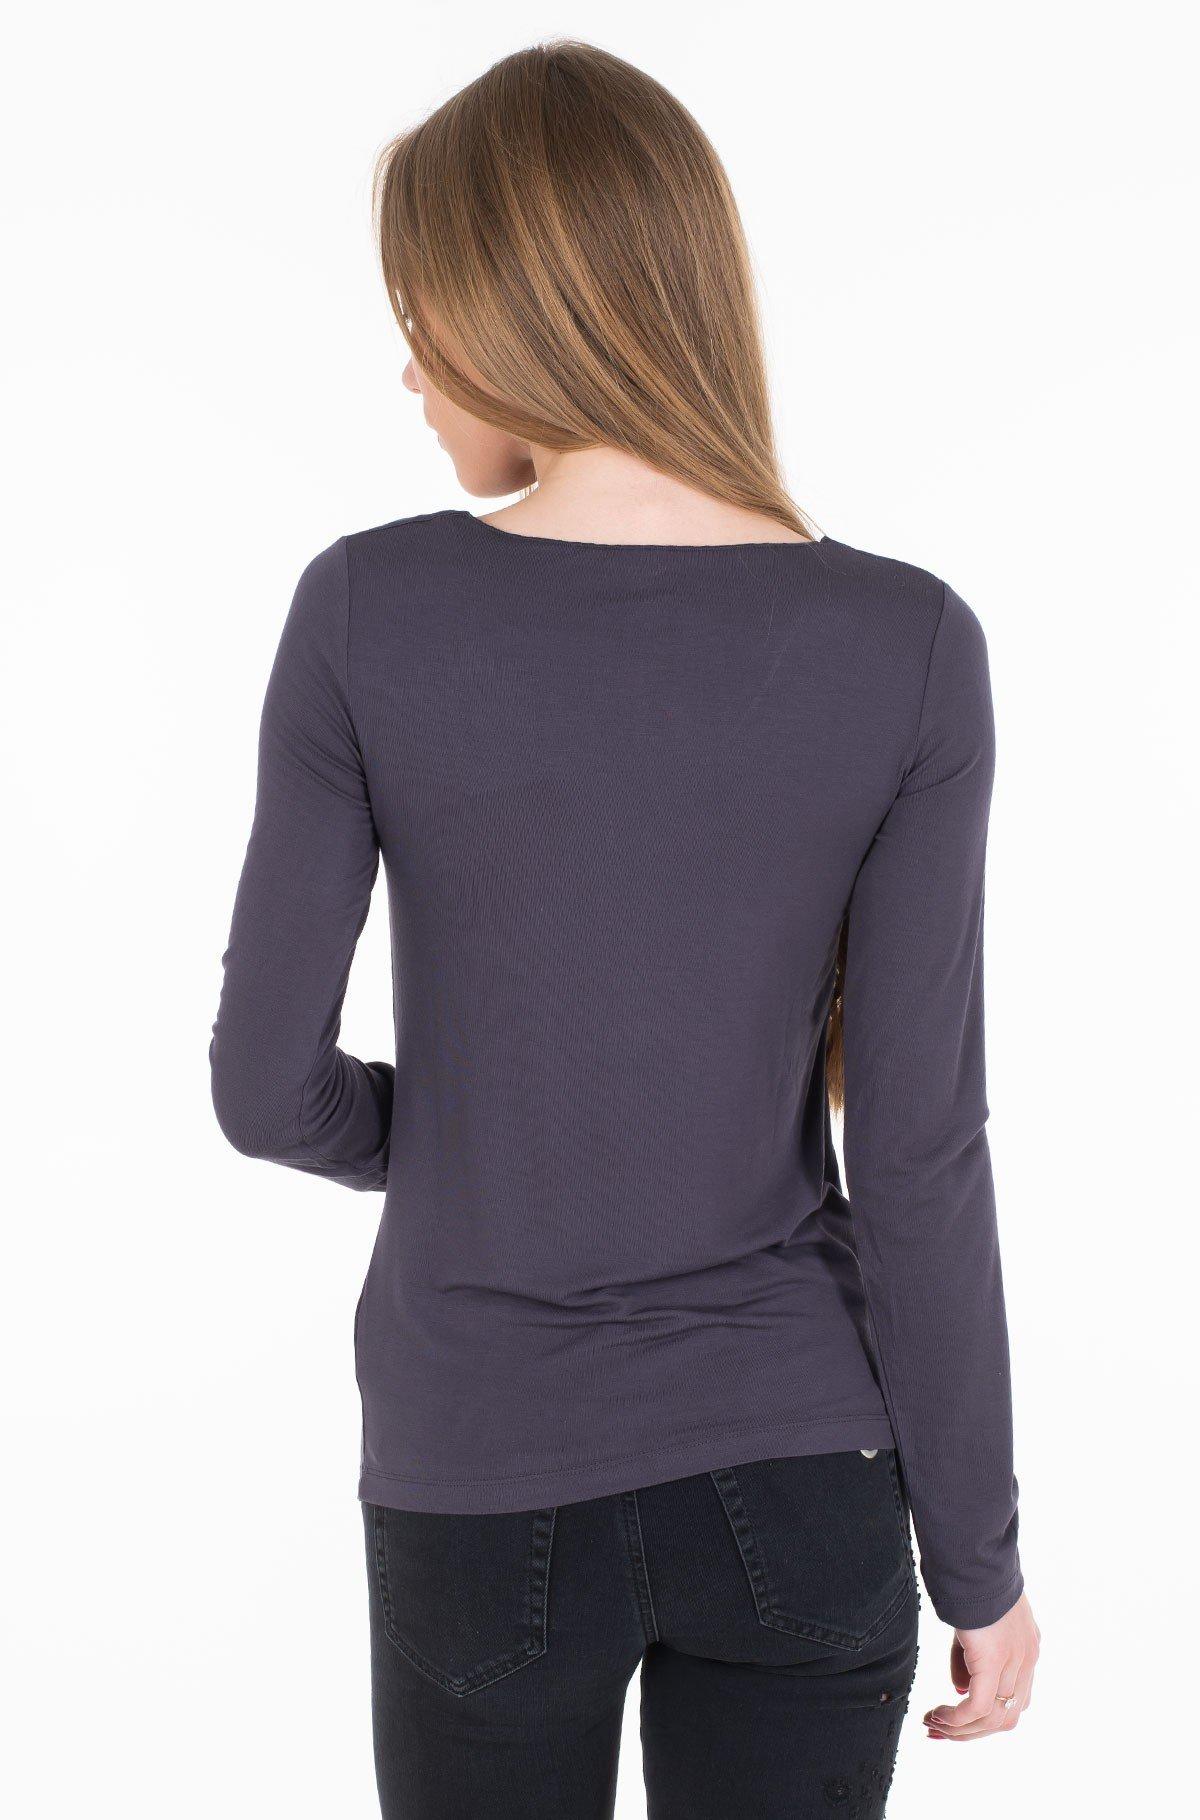 T-krekls ar garām piedurknēm  ANDY/PL504167-full-2